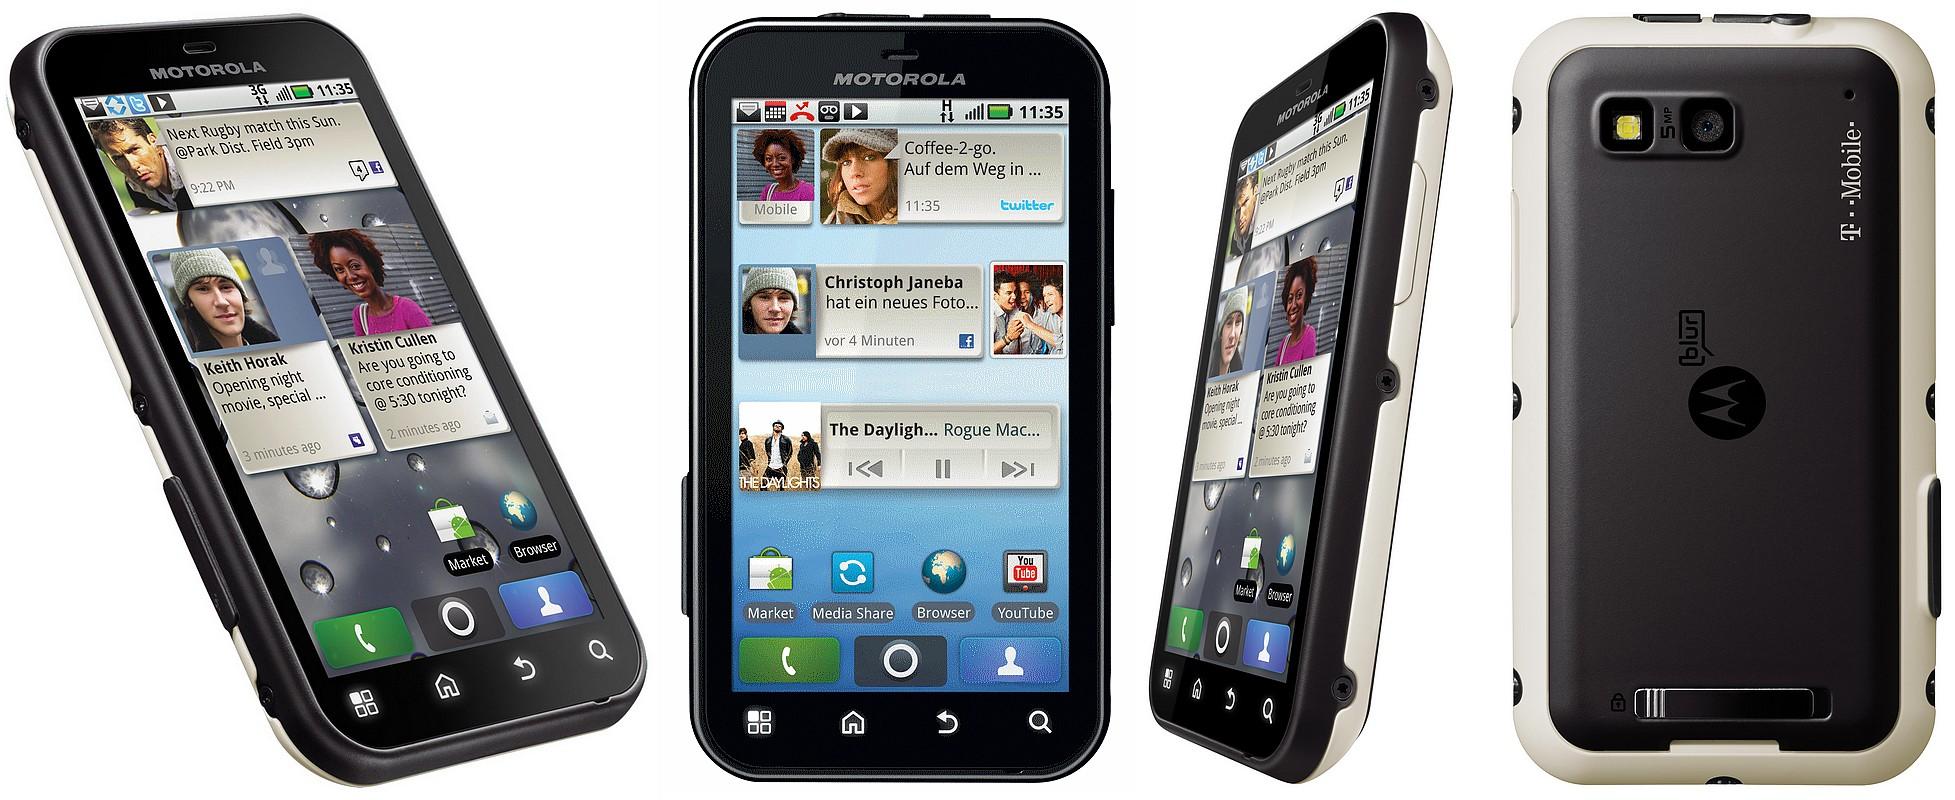 Motorola Defy, cu tripla rezistenta, a intrat la Cosmote